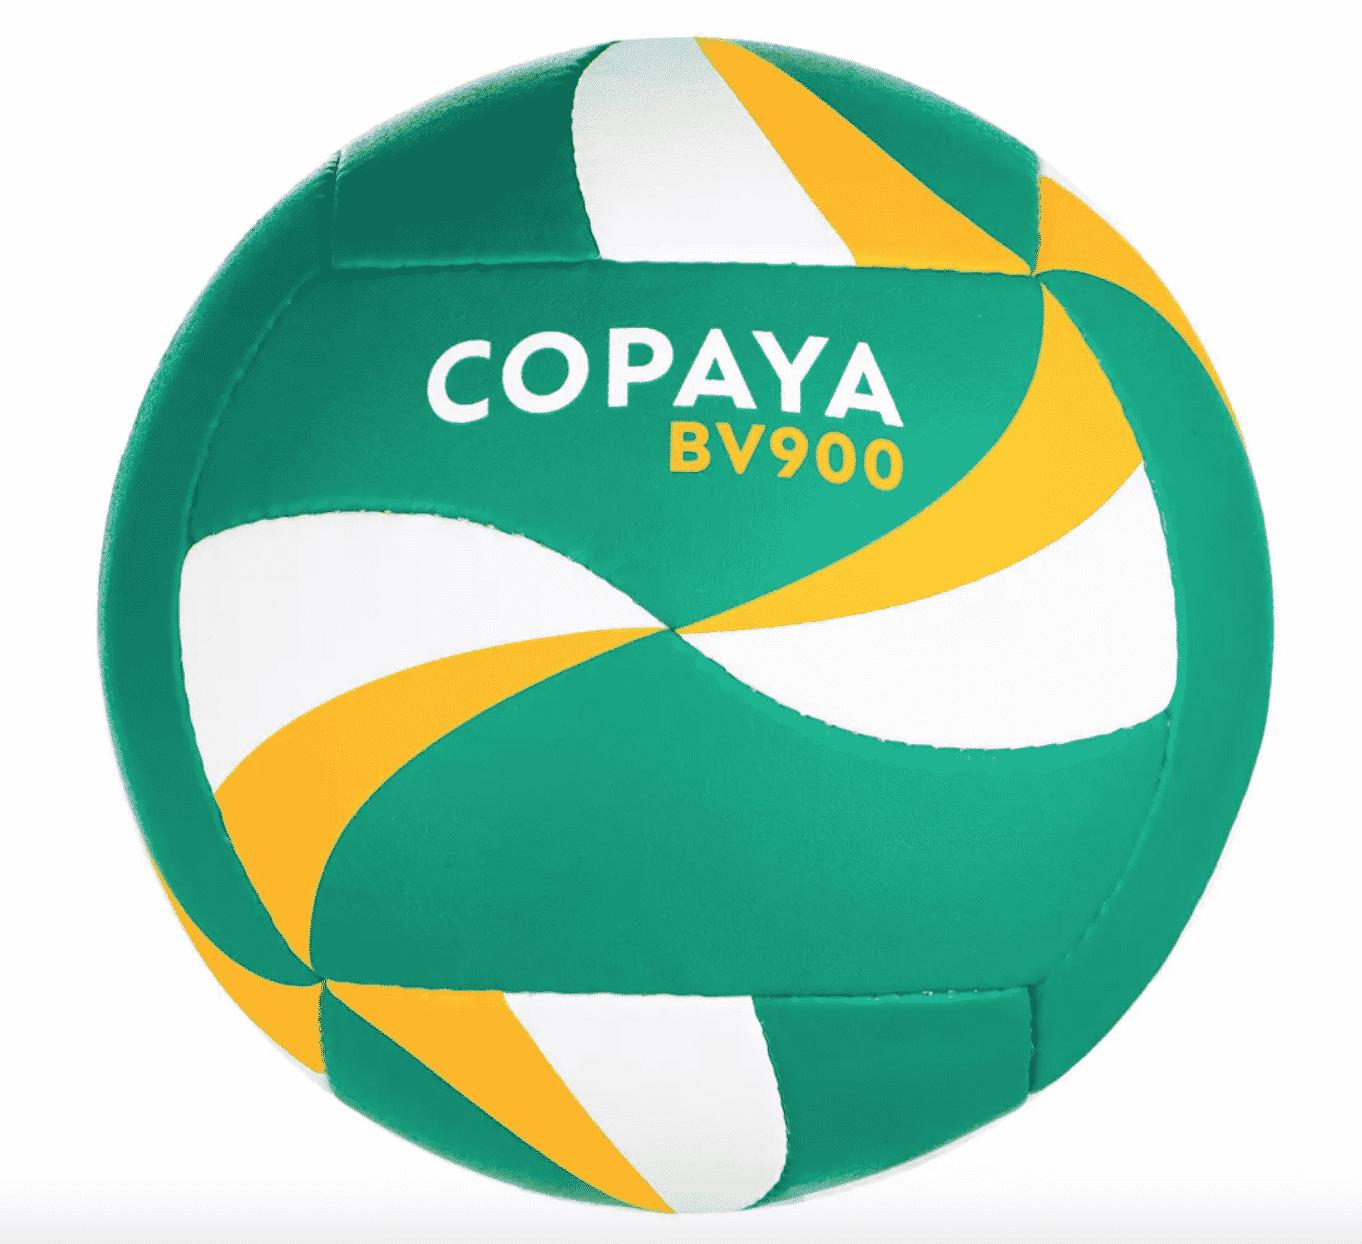 copaya-bv900-ballon-beach-volley-vert-jaune-2020-5